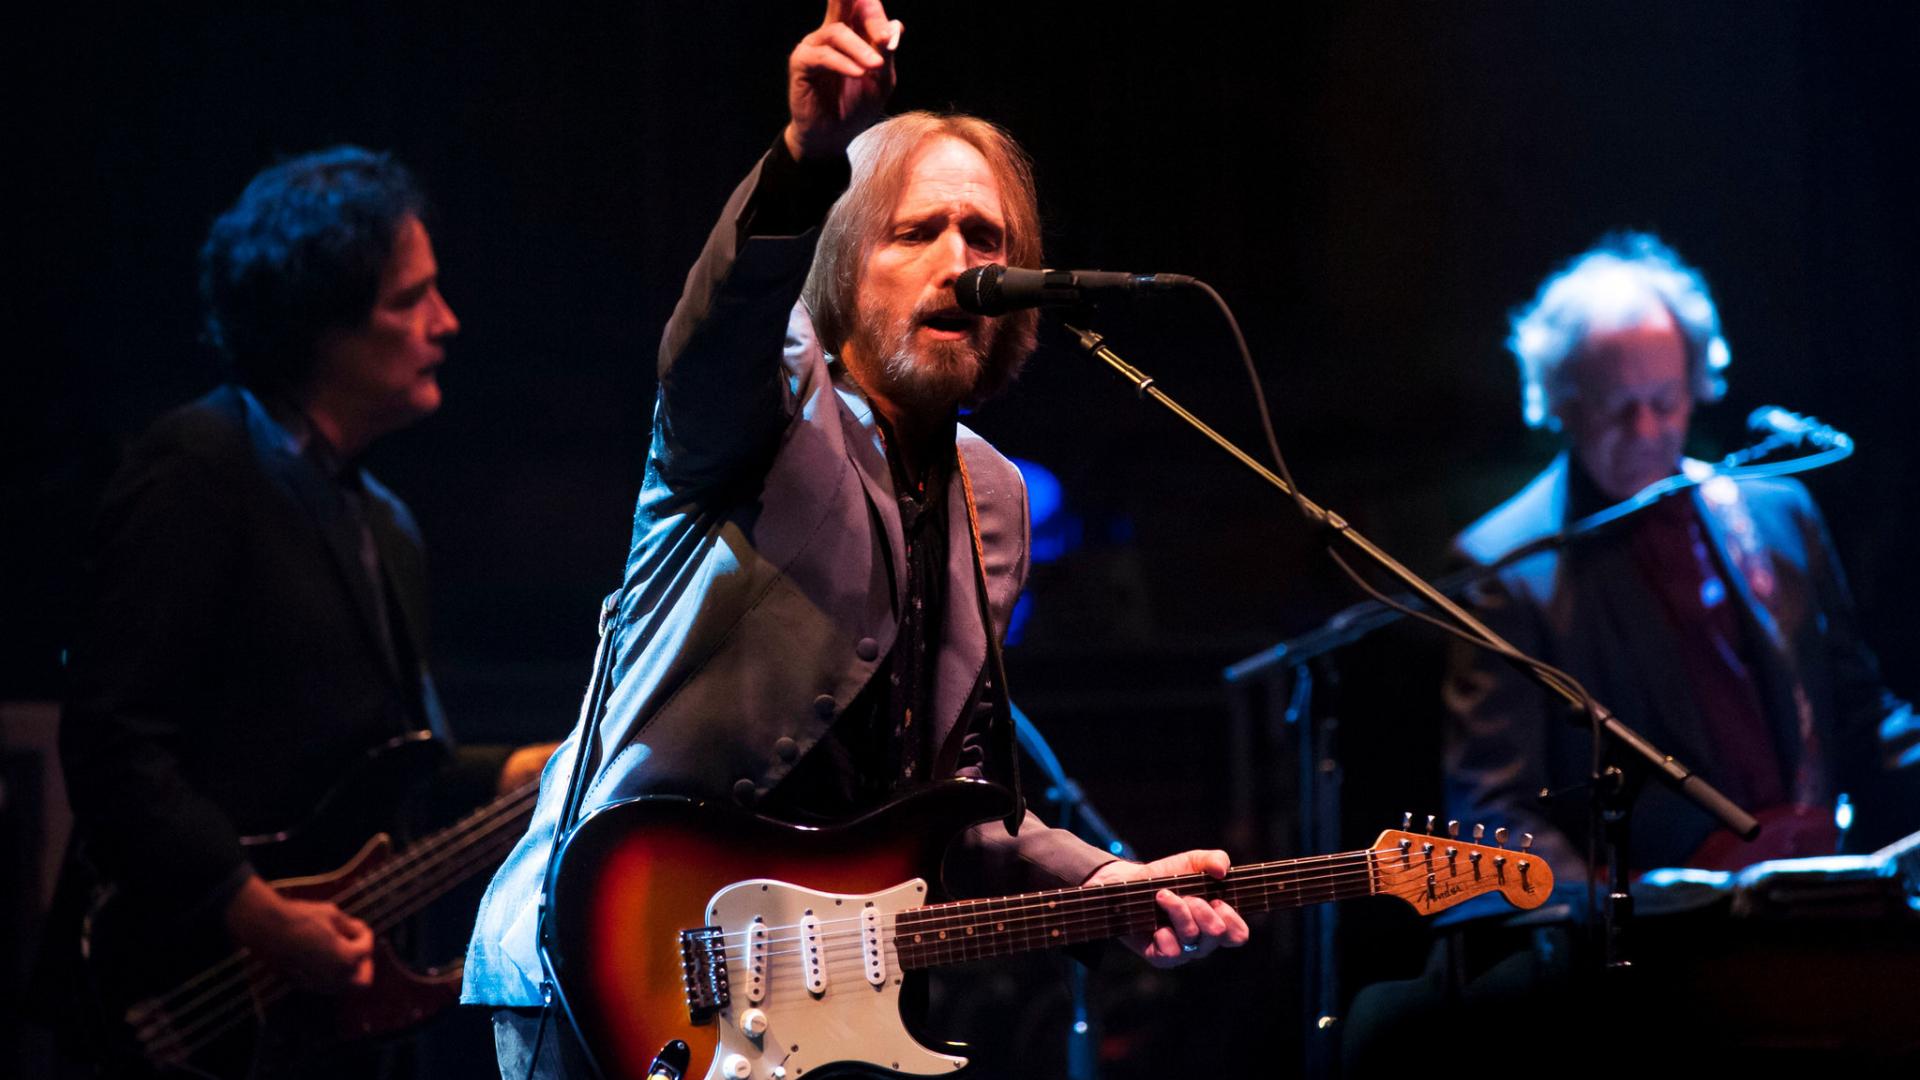 Free Download Tom Petty And The Heartbreakers Desktop Wallpaper